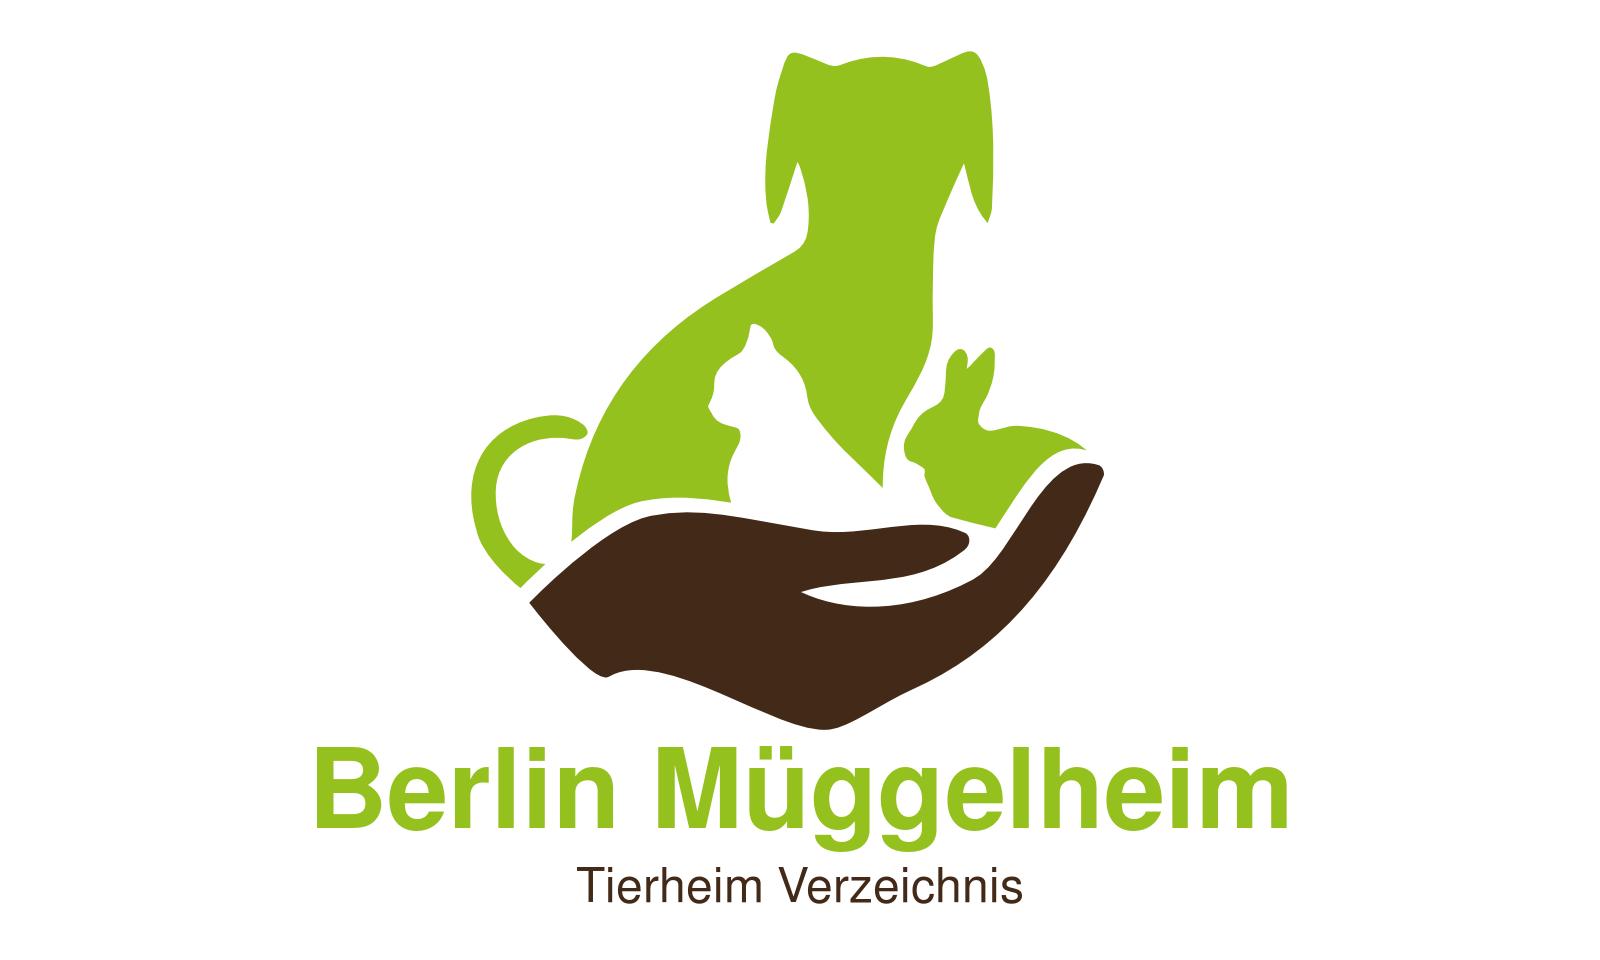 Tierheim Berlin Müggelheim